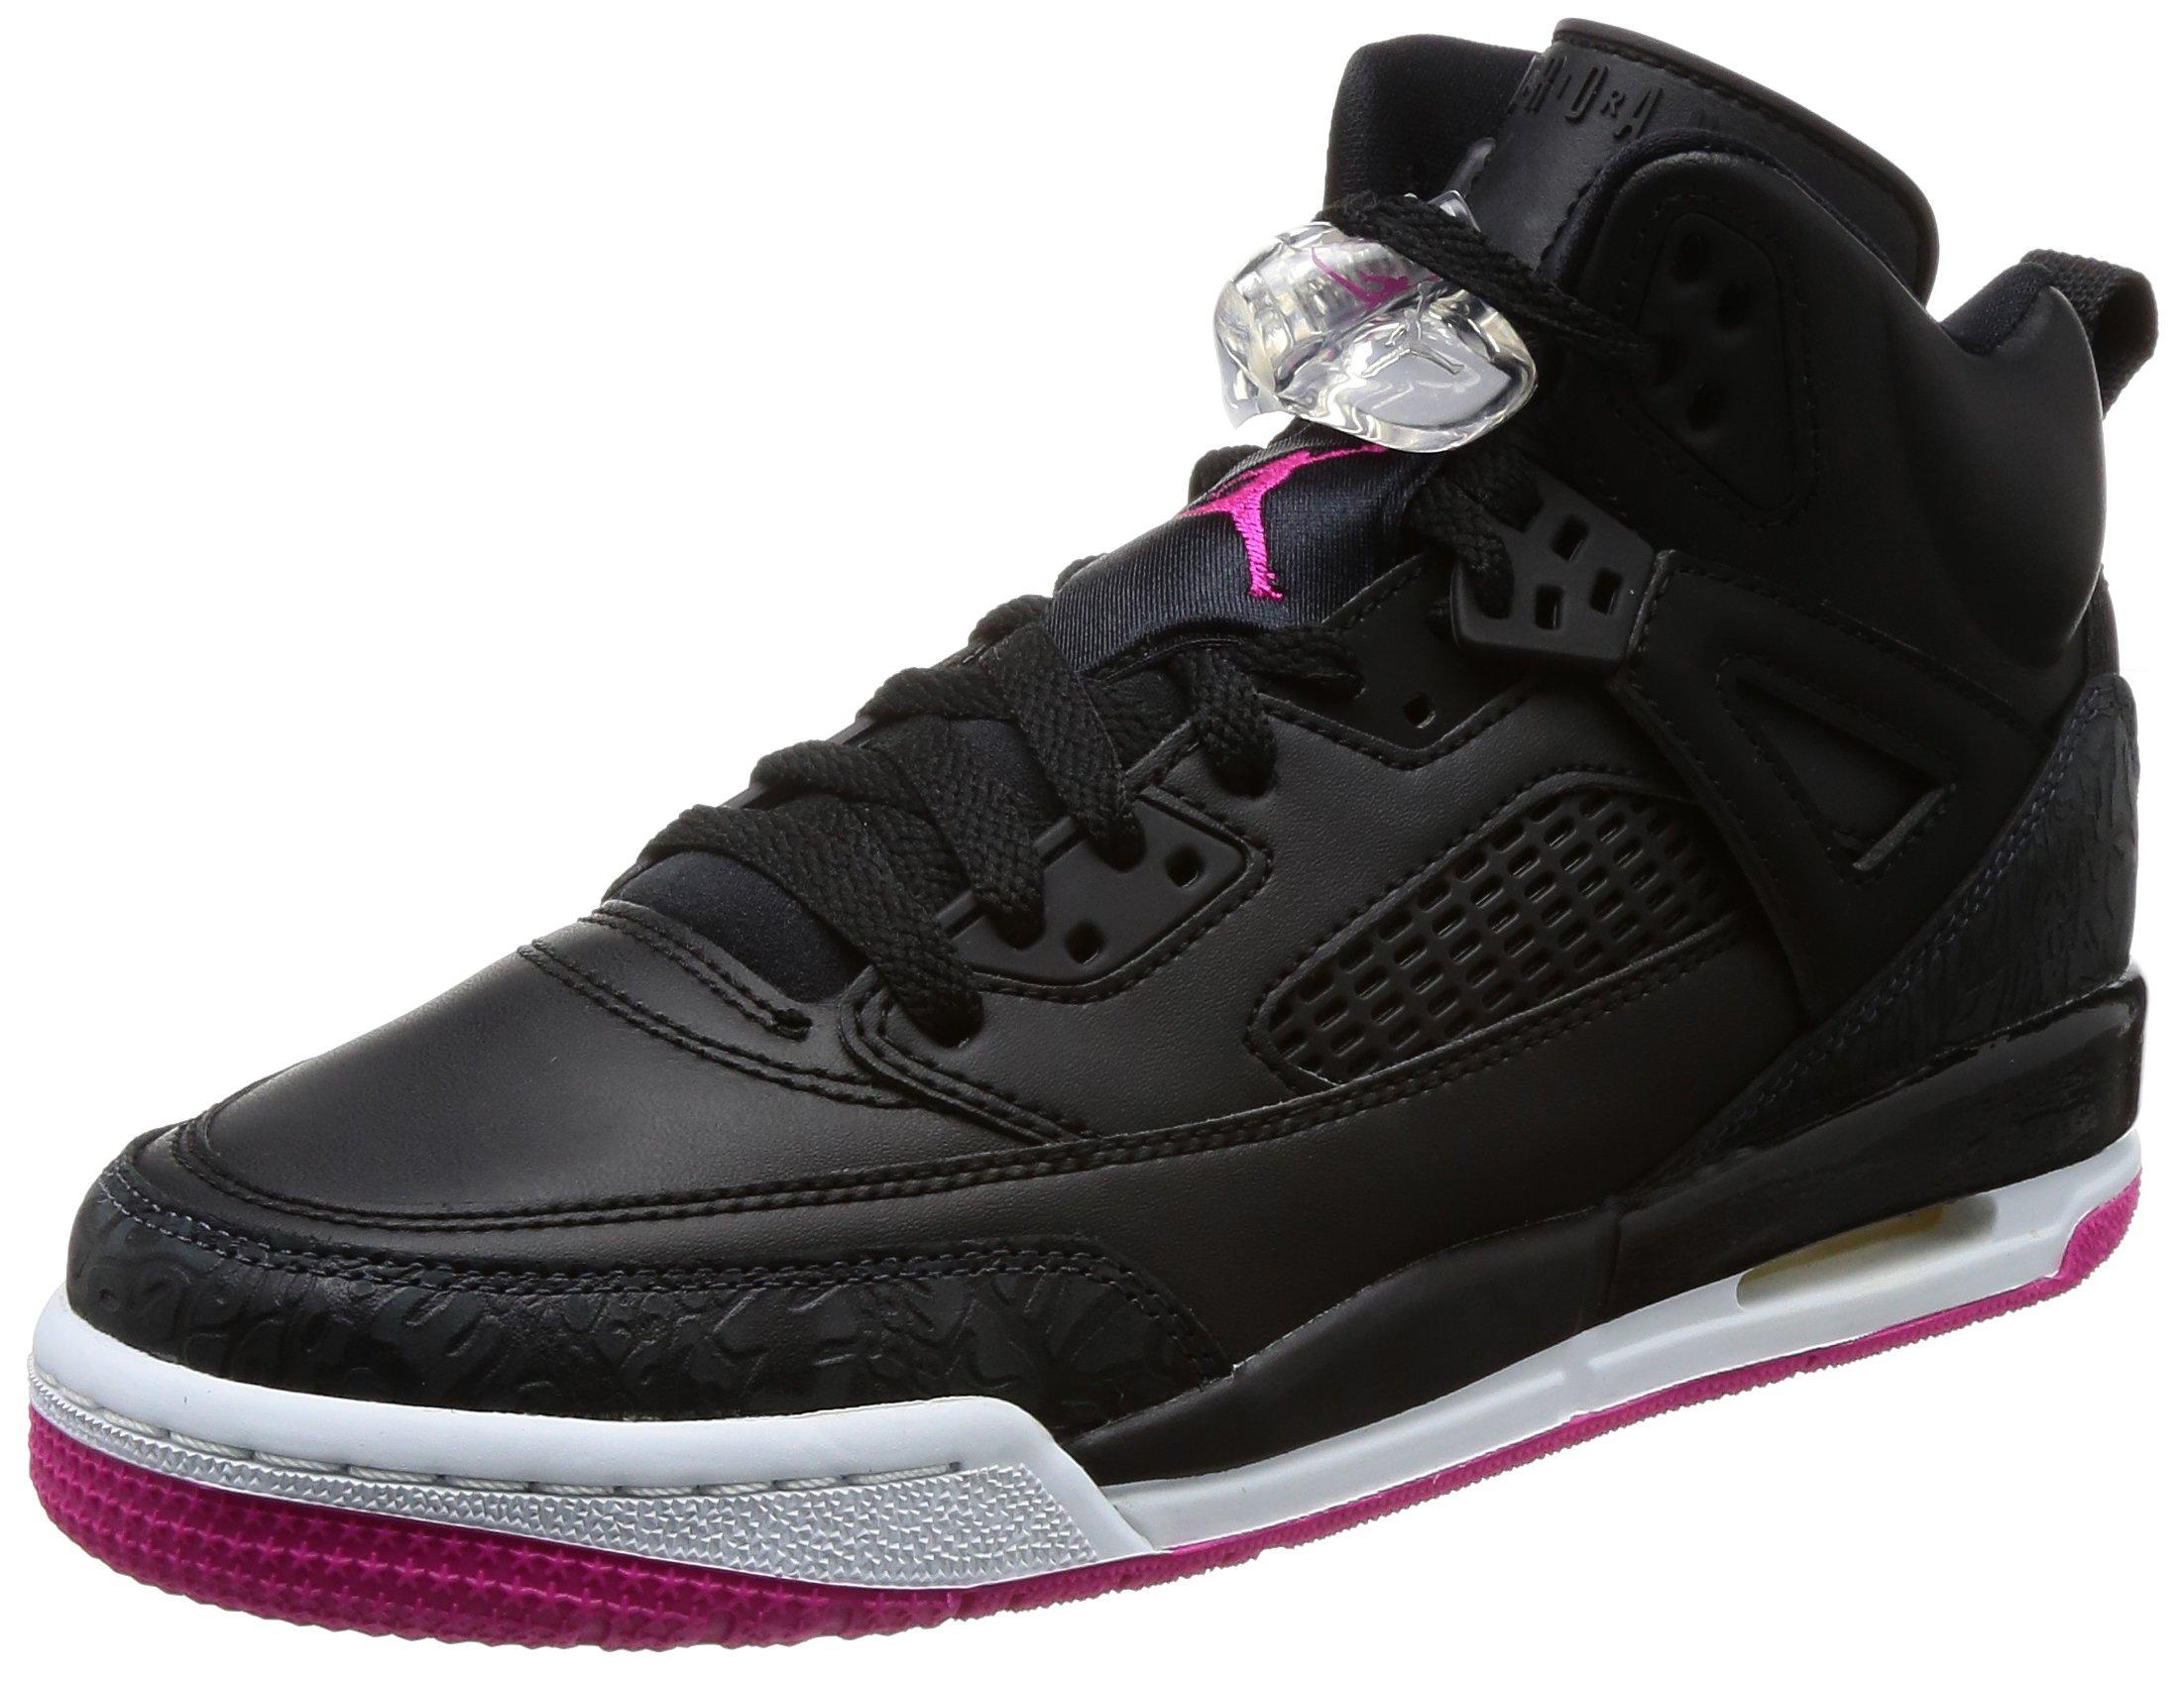 Jordan Nike Kids Spizike GG Black/Deadly Pink Anthracite Basketball Shoe 6 Kids US